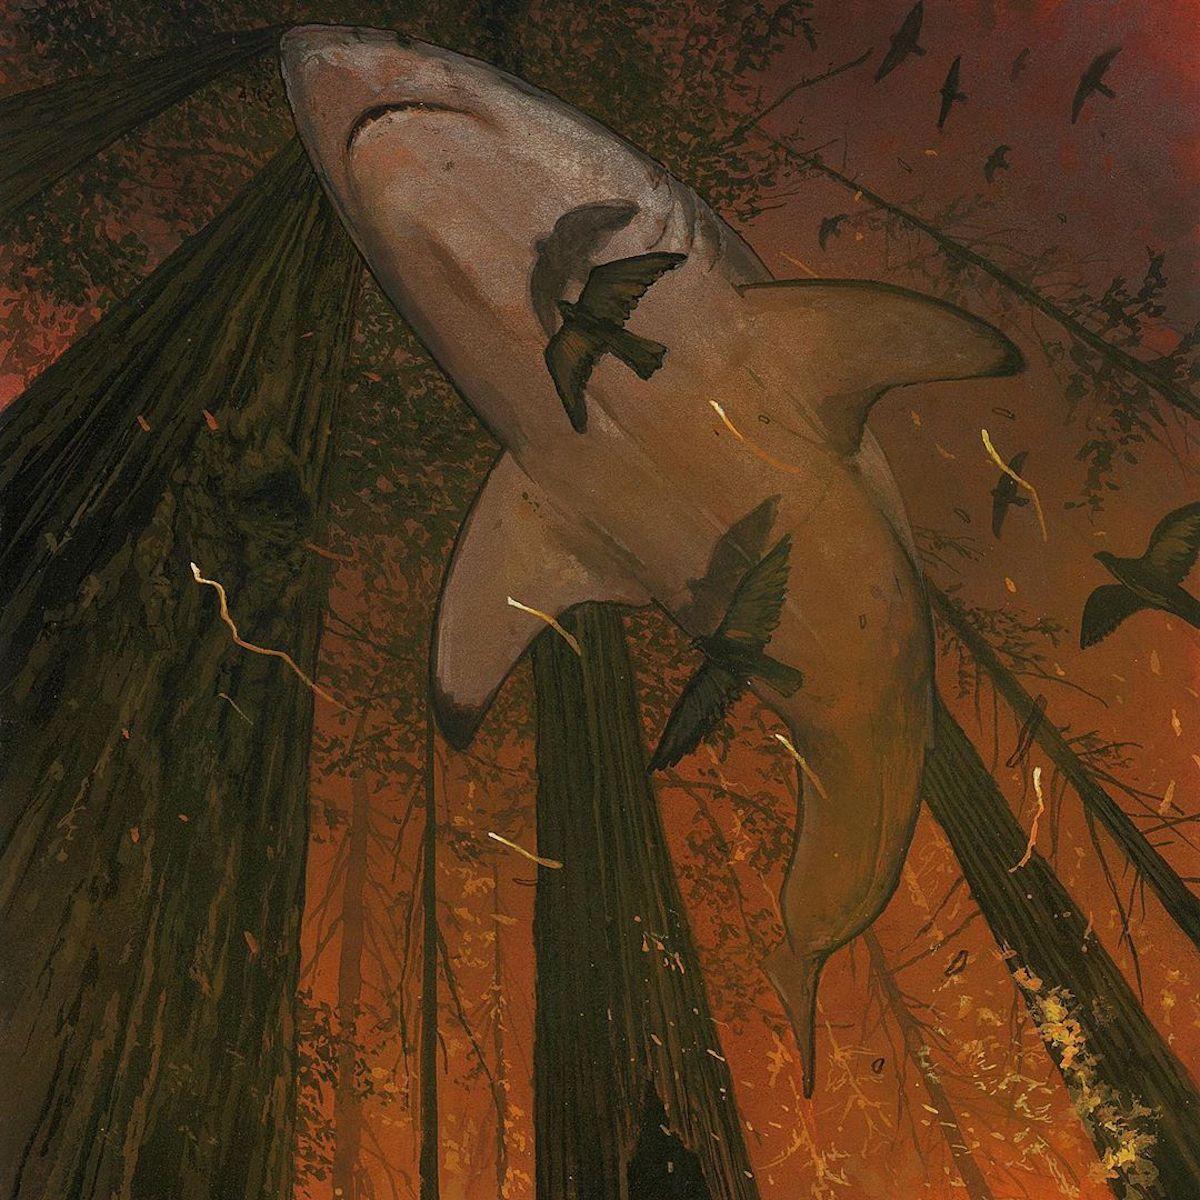 chris-austin-shark-paintings-moss-and-fog-7